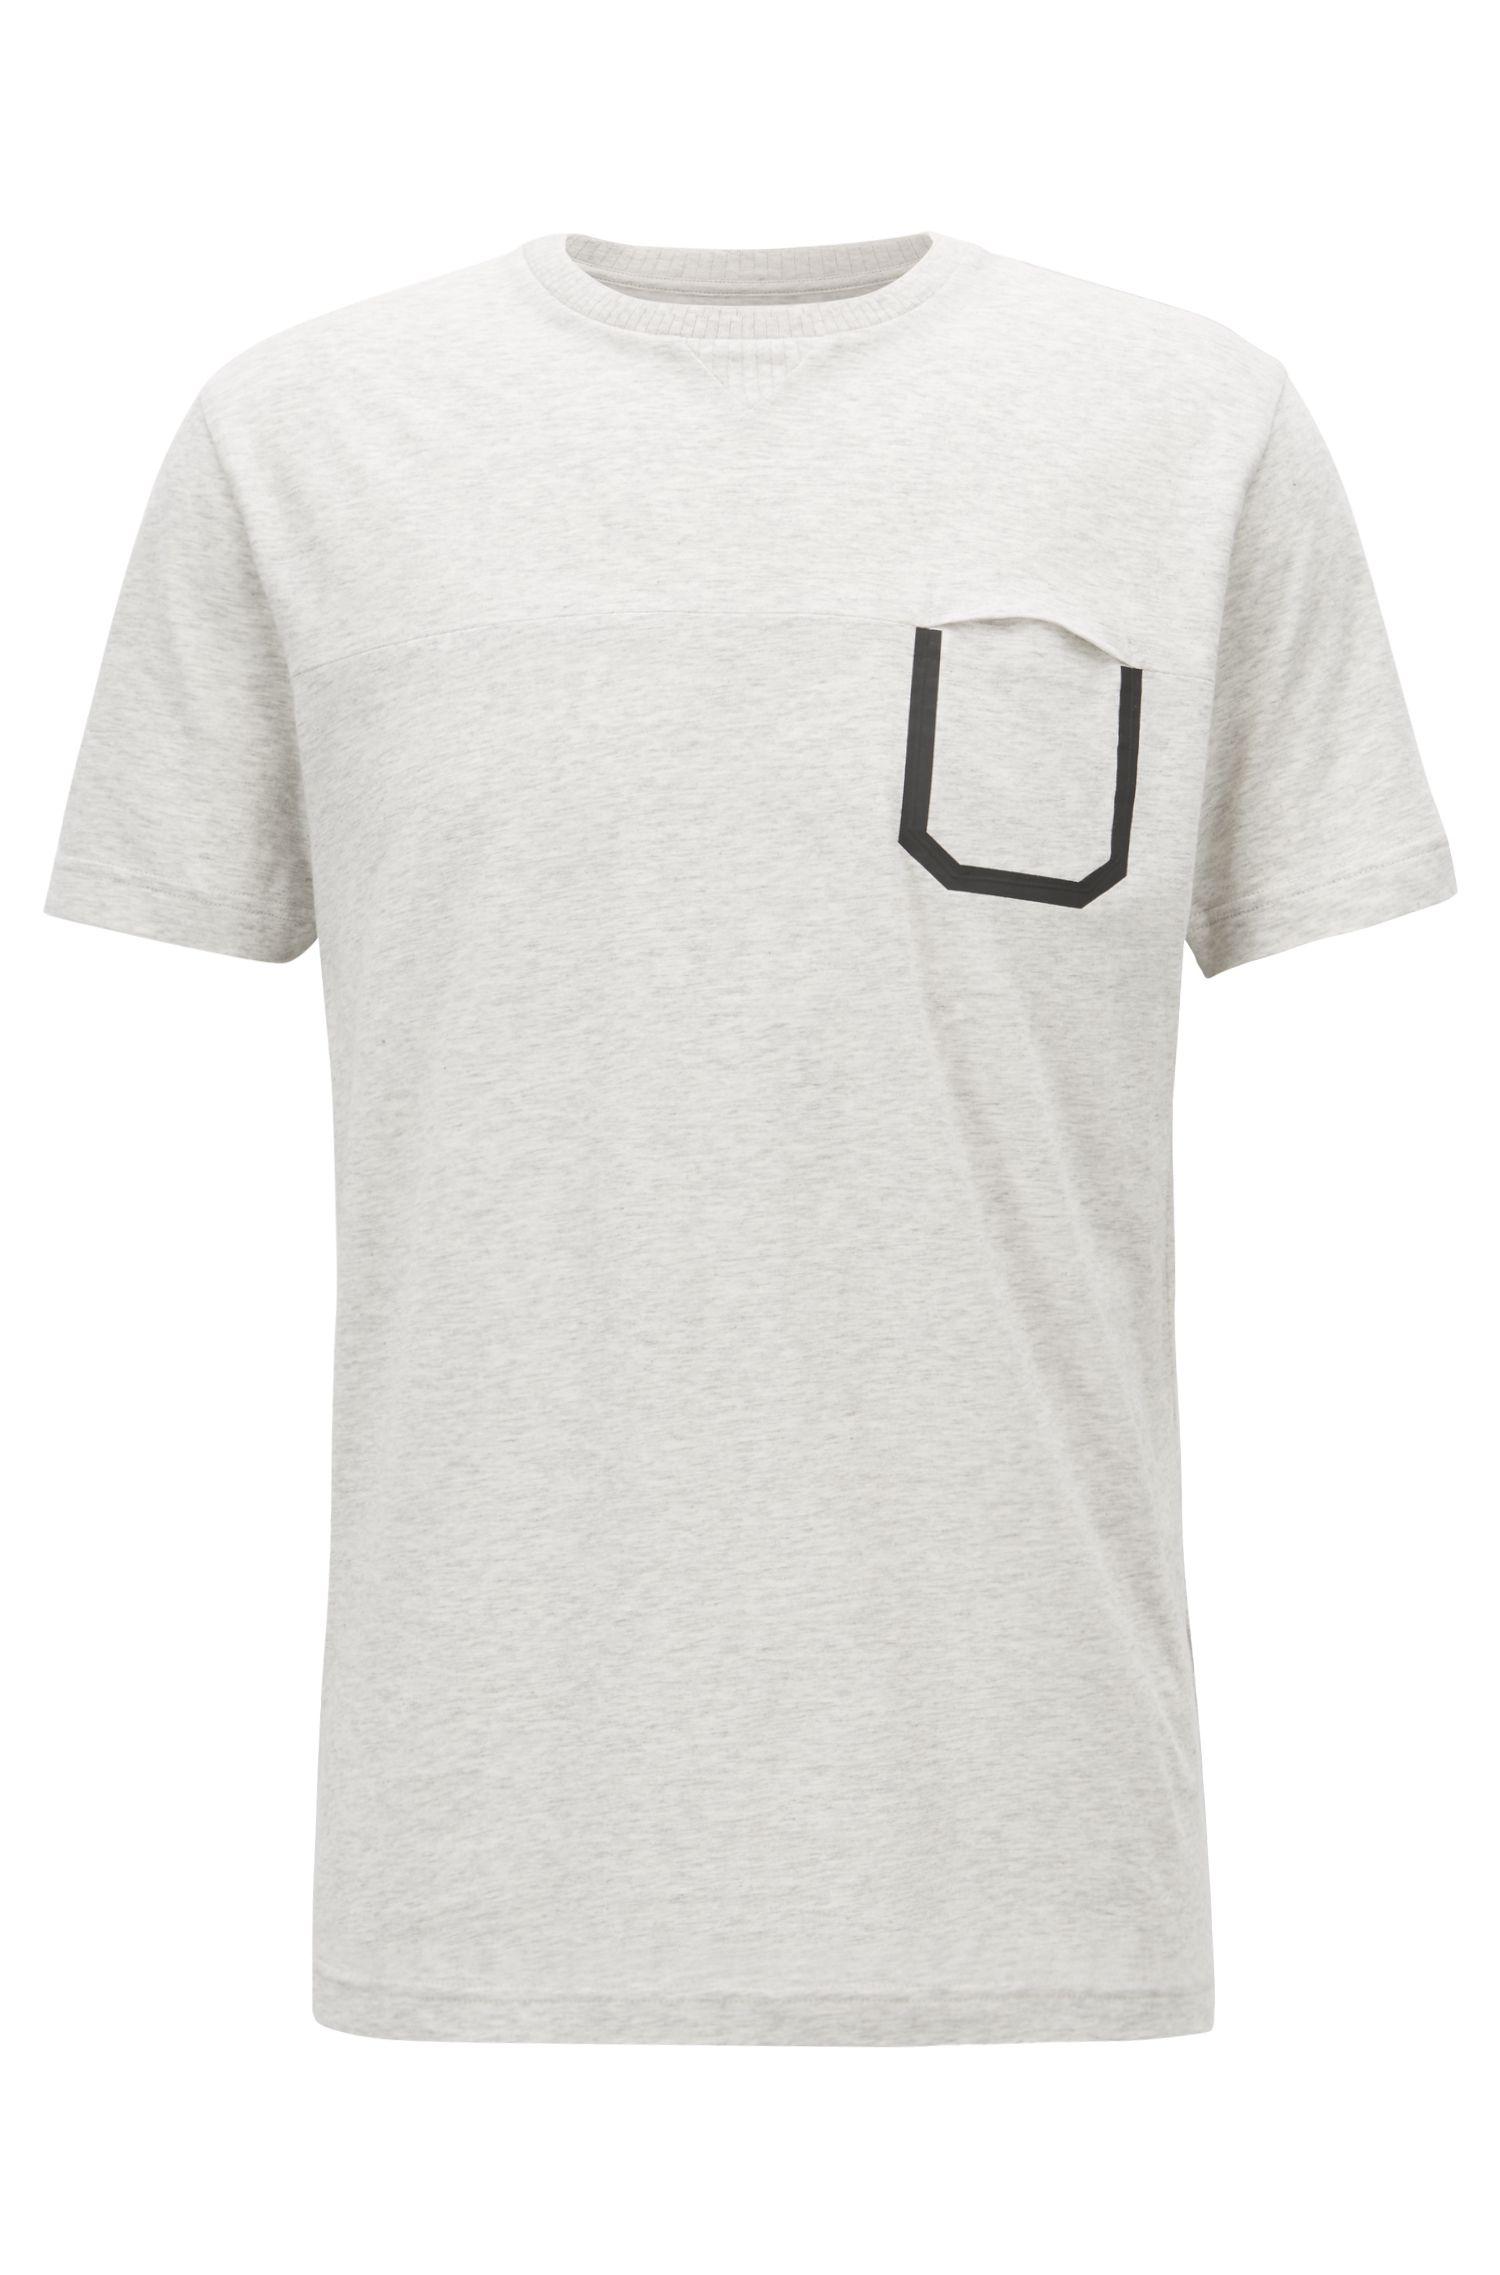 Melange cotton T-shirt with pocket detail